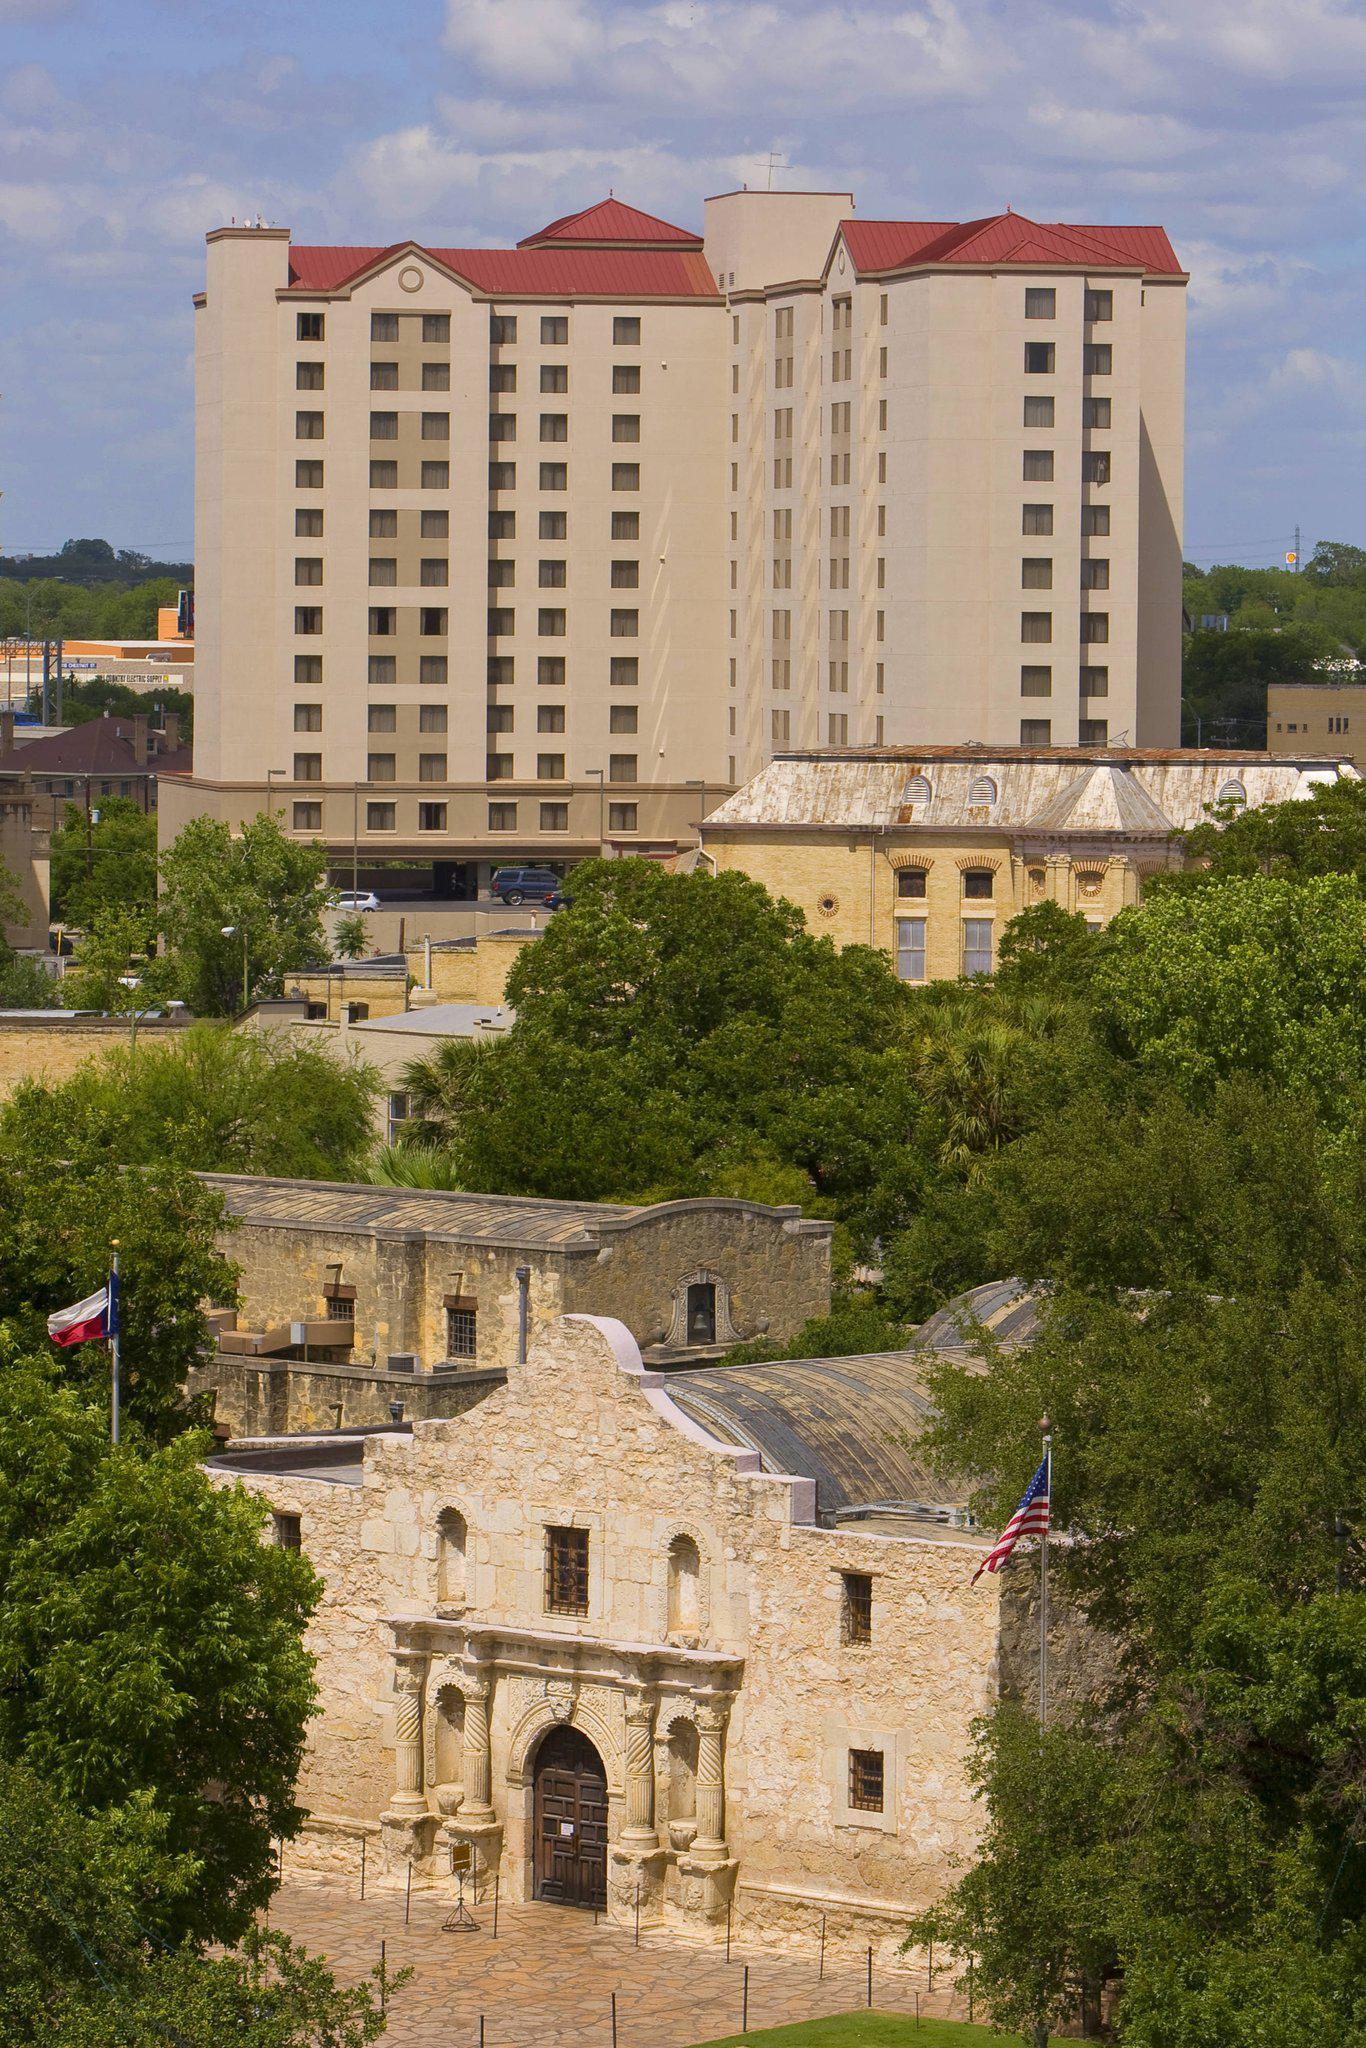 Residence Inn by Marriott San Antonio Downtown/Alamo Plaza in San Antonio, TX, photo #2